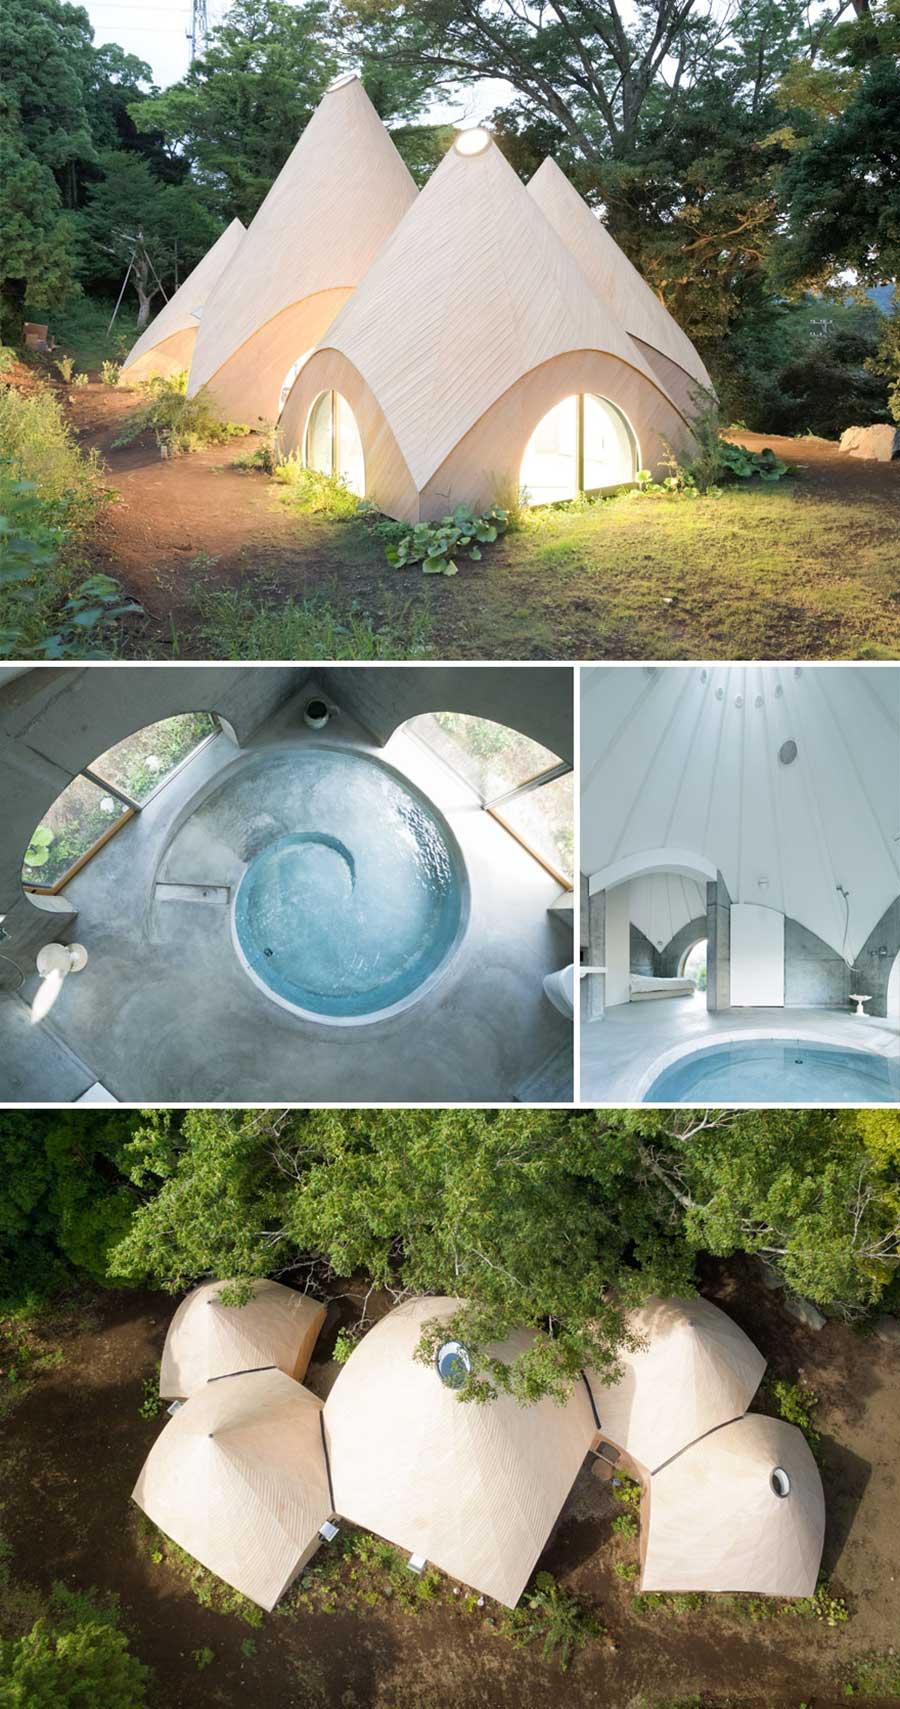 kiến trúc Nhật Bản